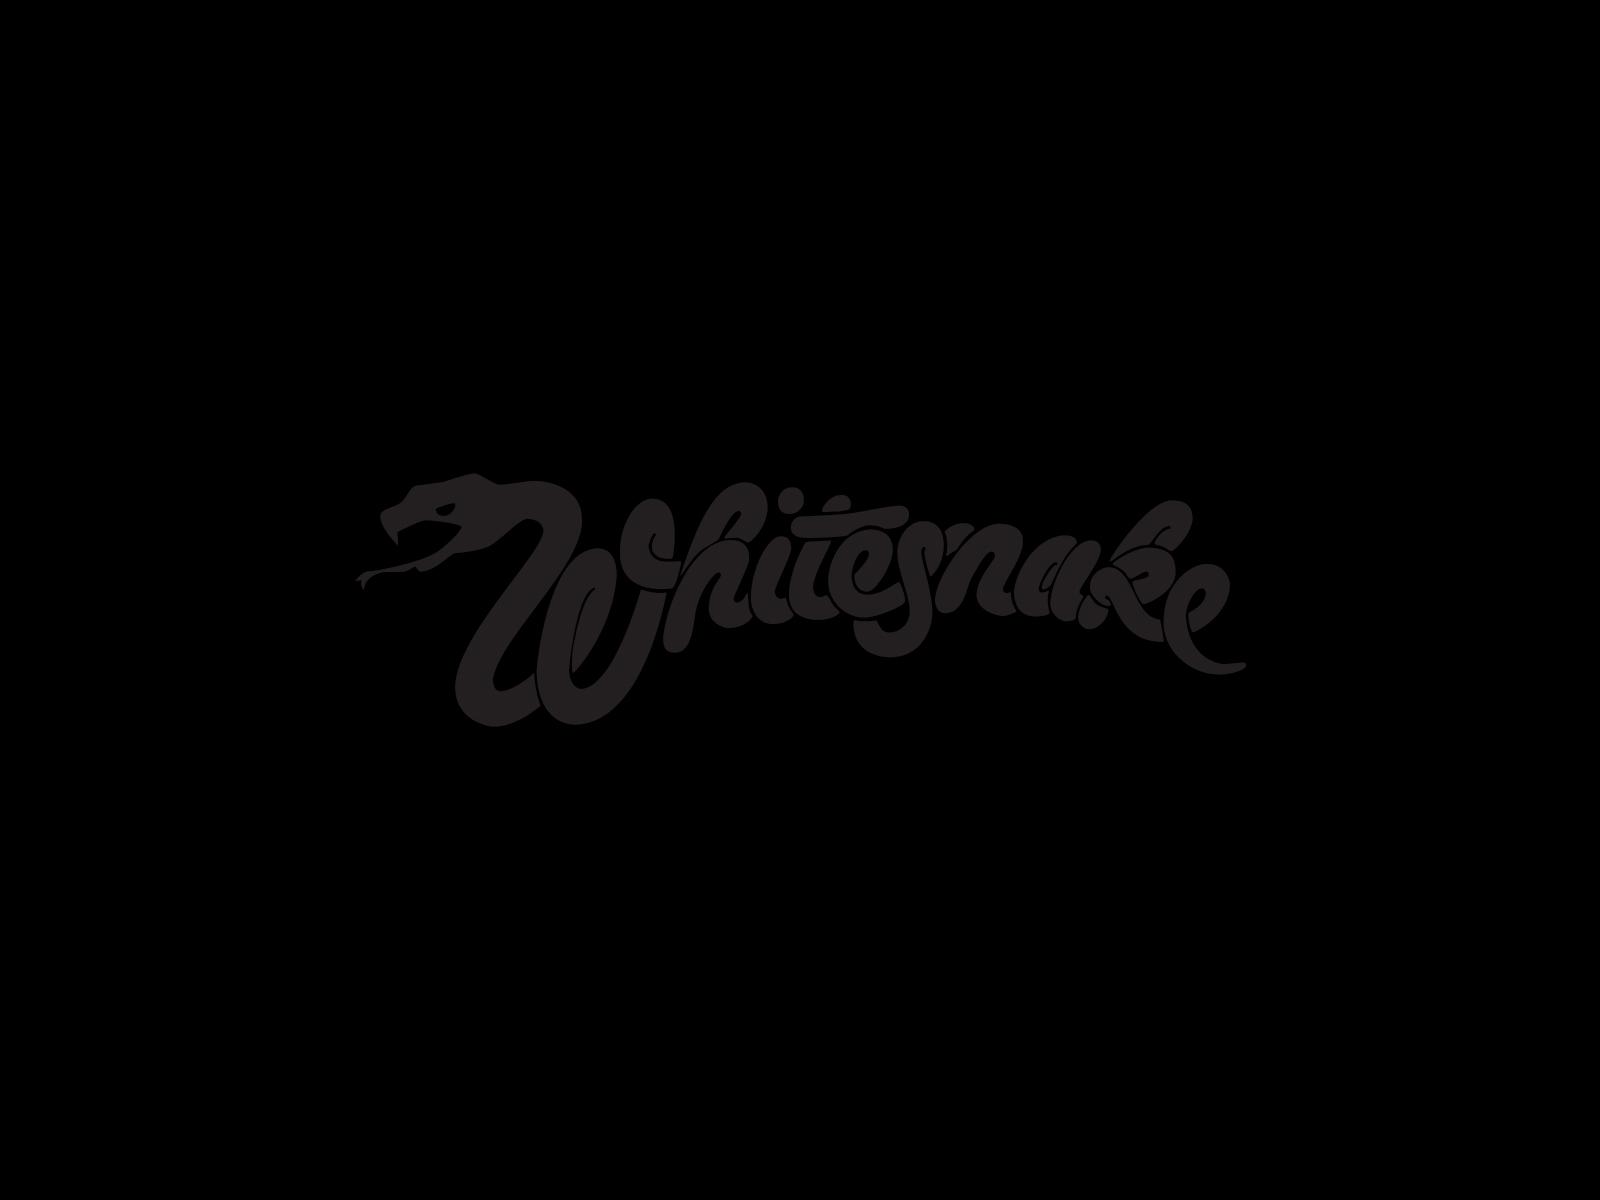 Whitesnake band logo and wallpaper 1600x1200